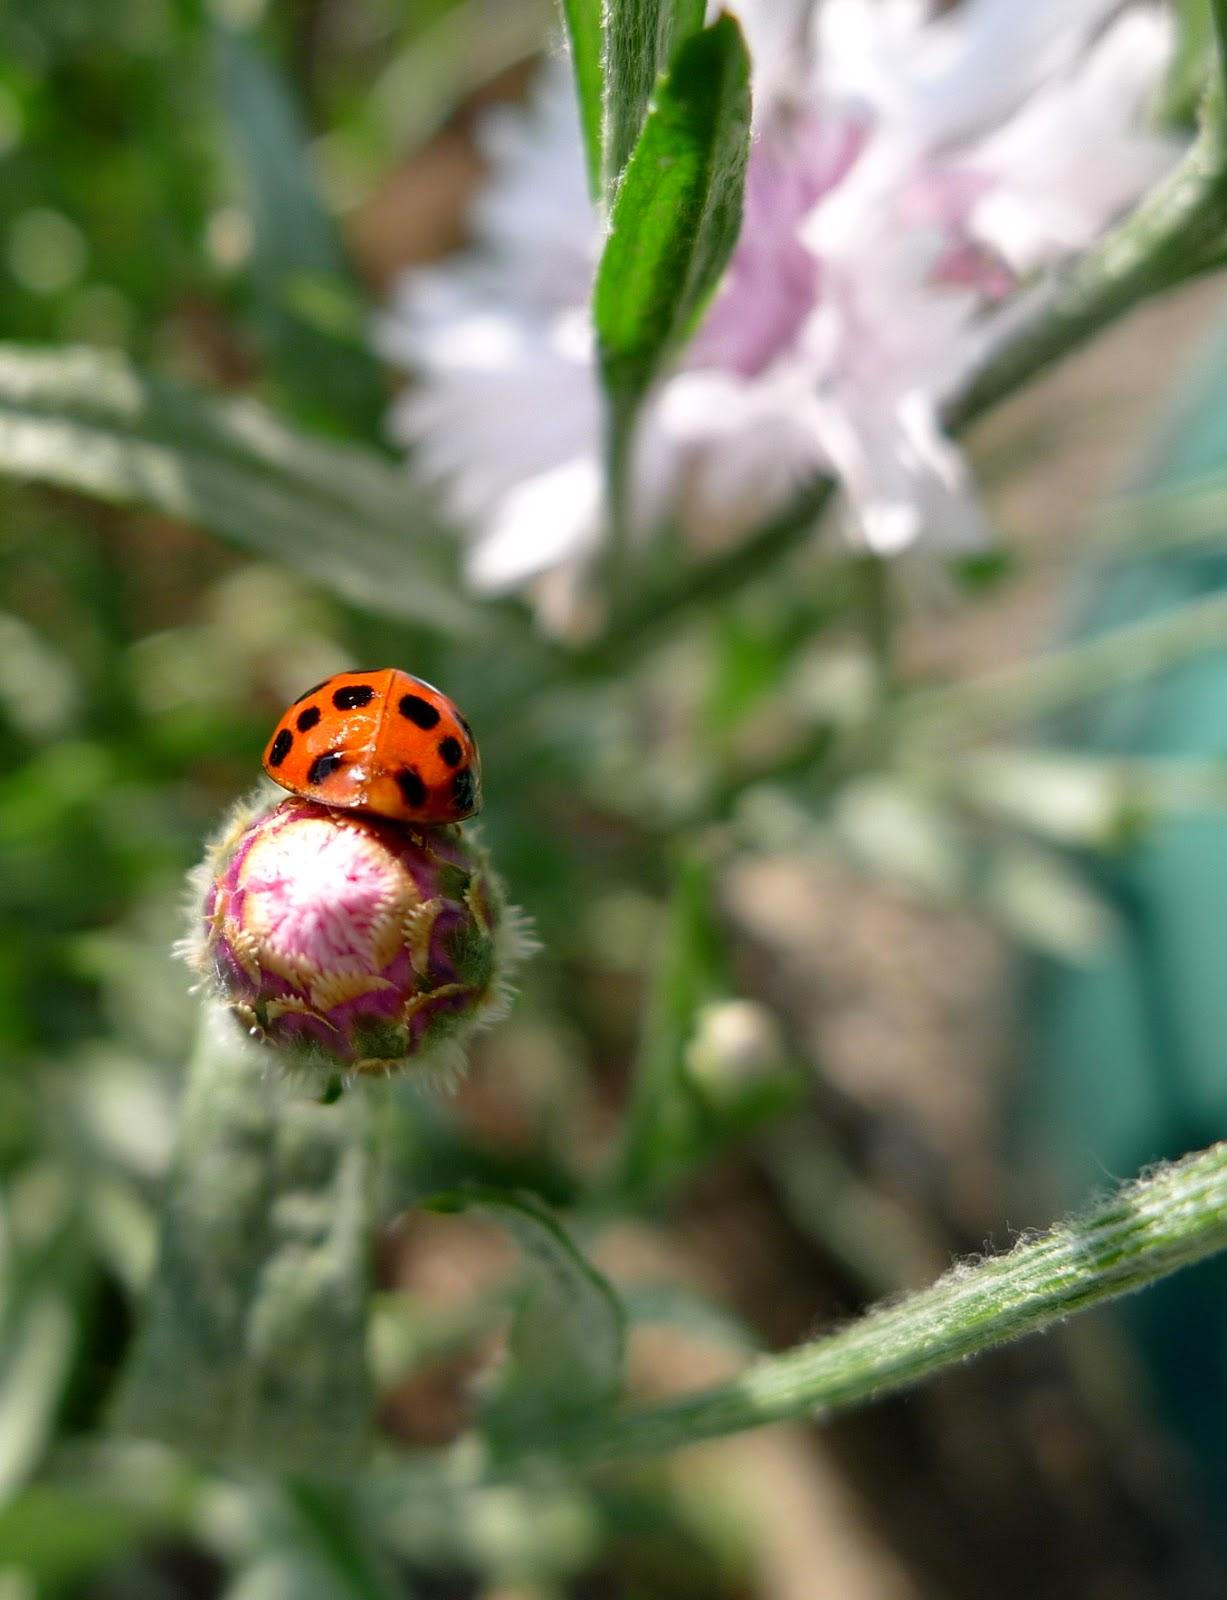 Lady bug, pollinators, urban farming